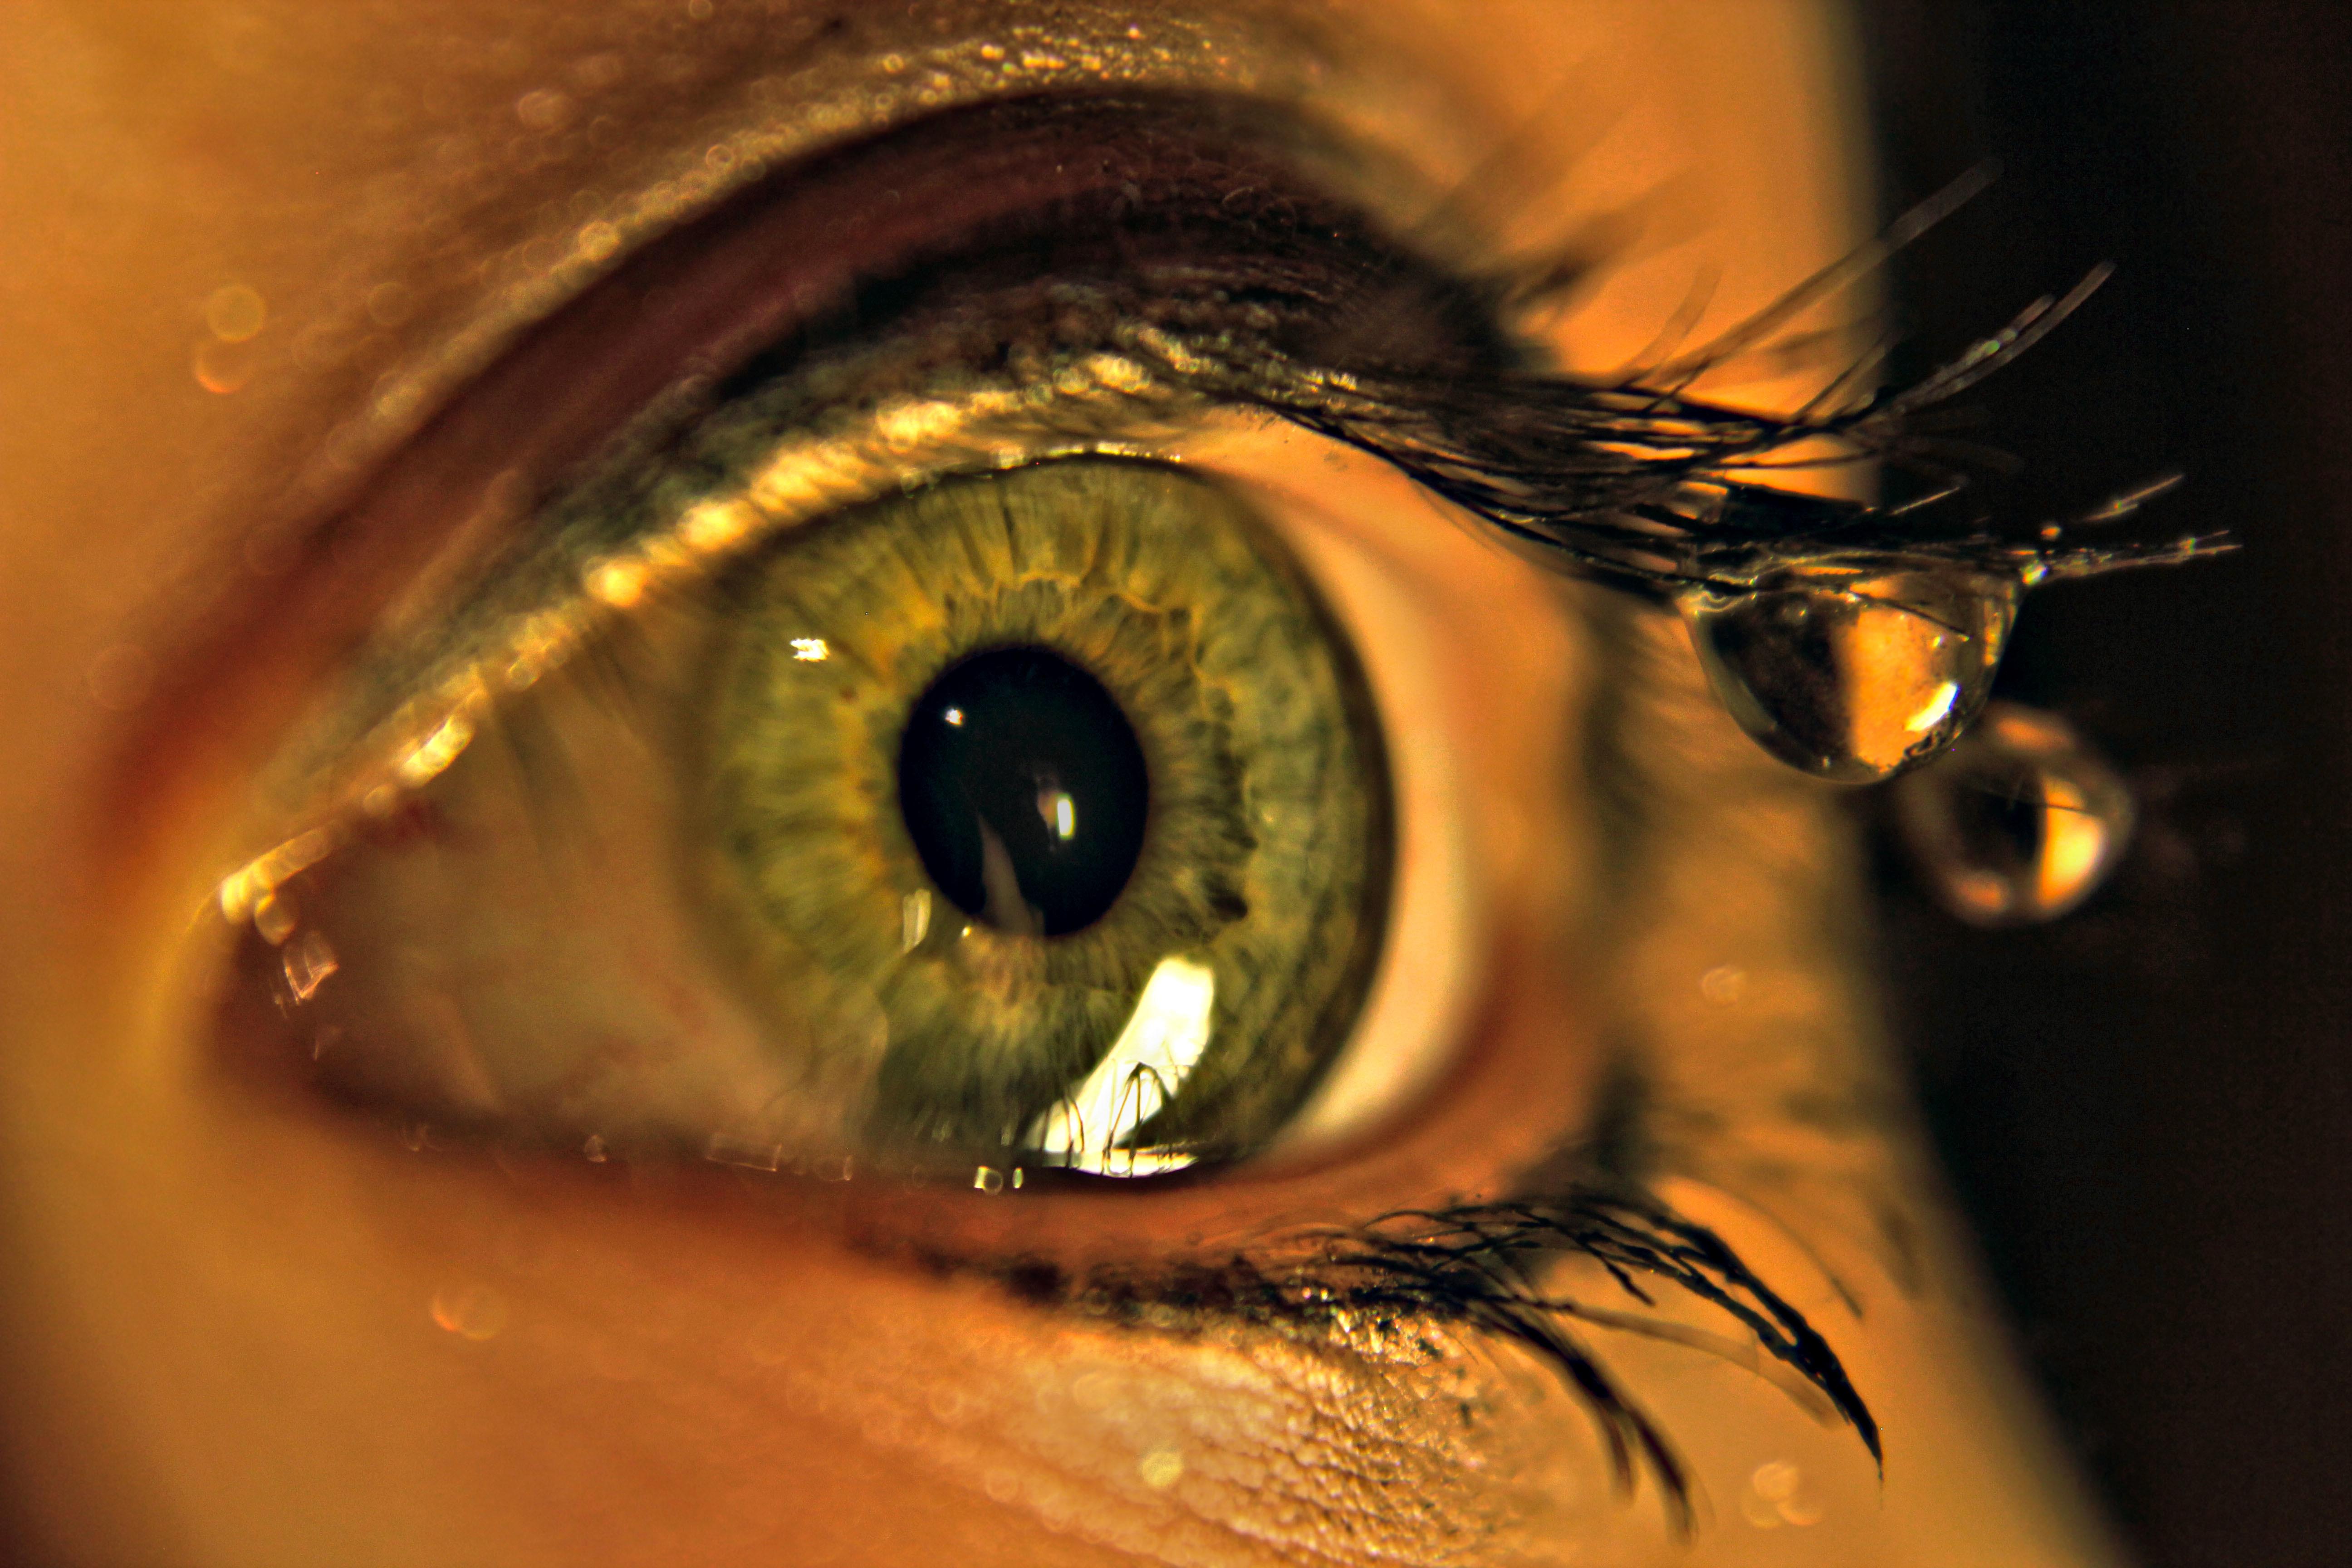 144127 download wallpaper Macro, Eye, Drops, Eyelashes, Eyelash screensavers and pictures for free